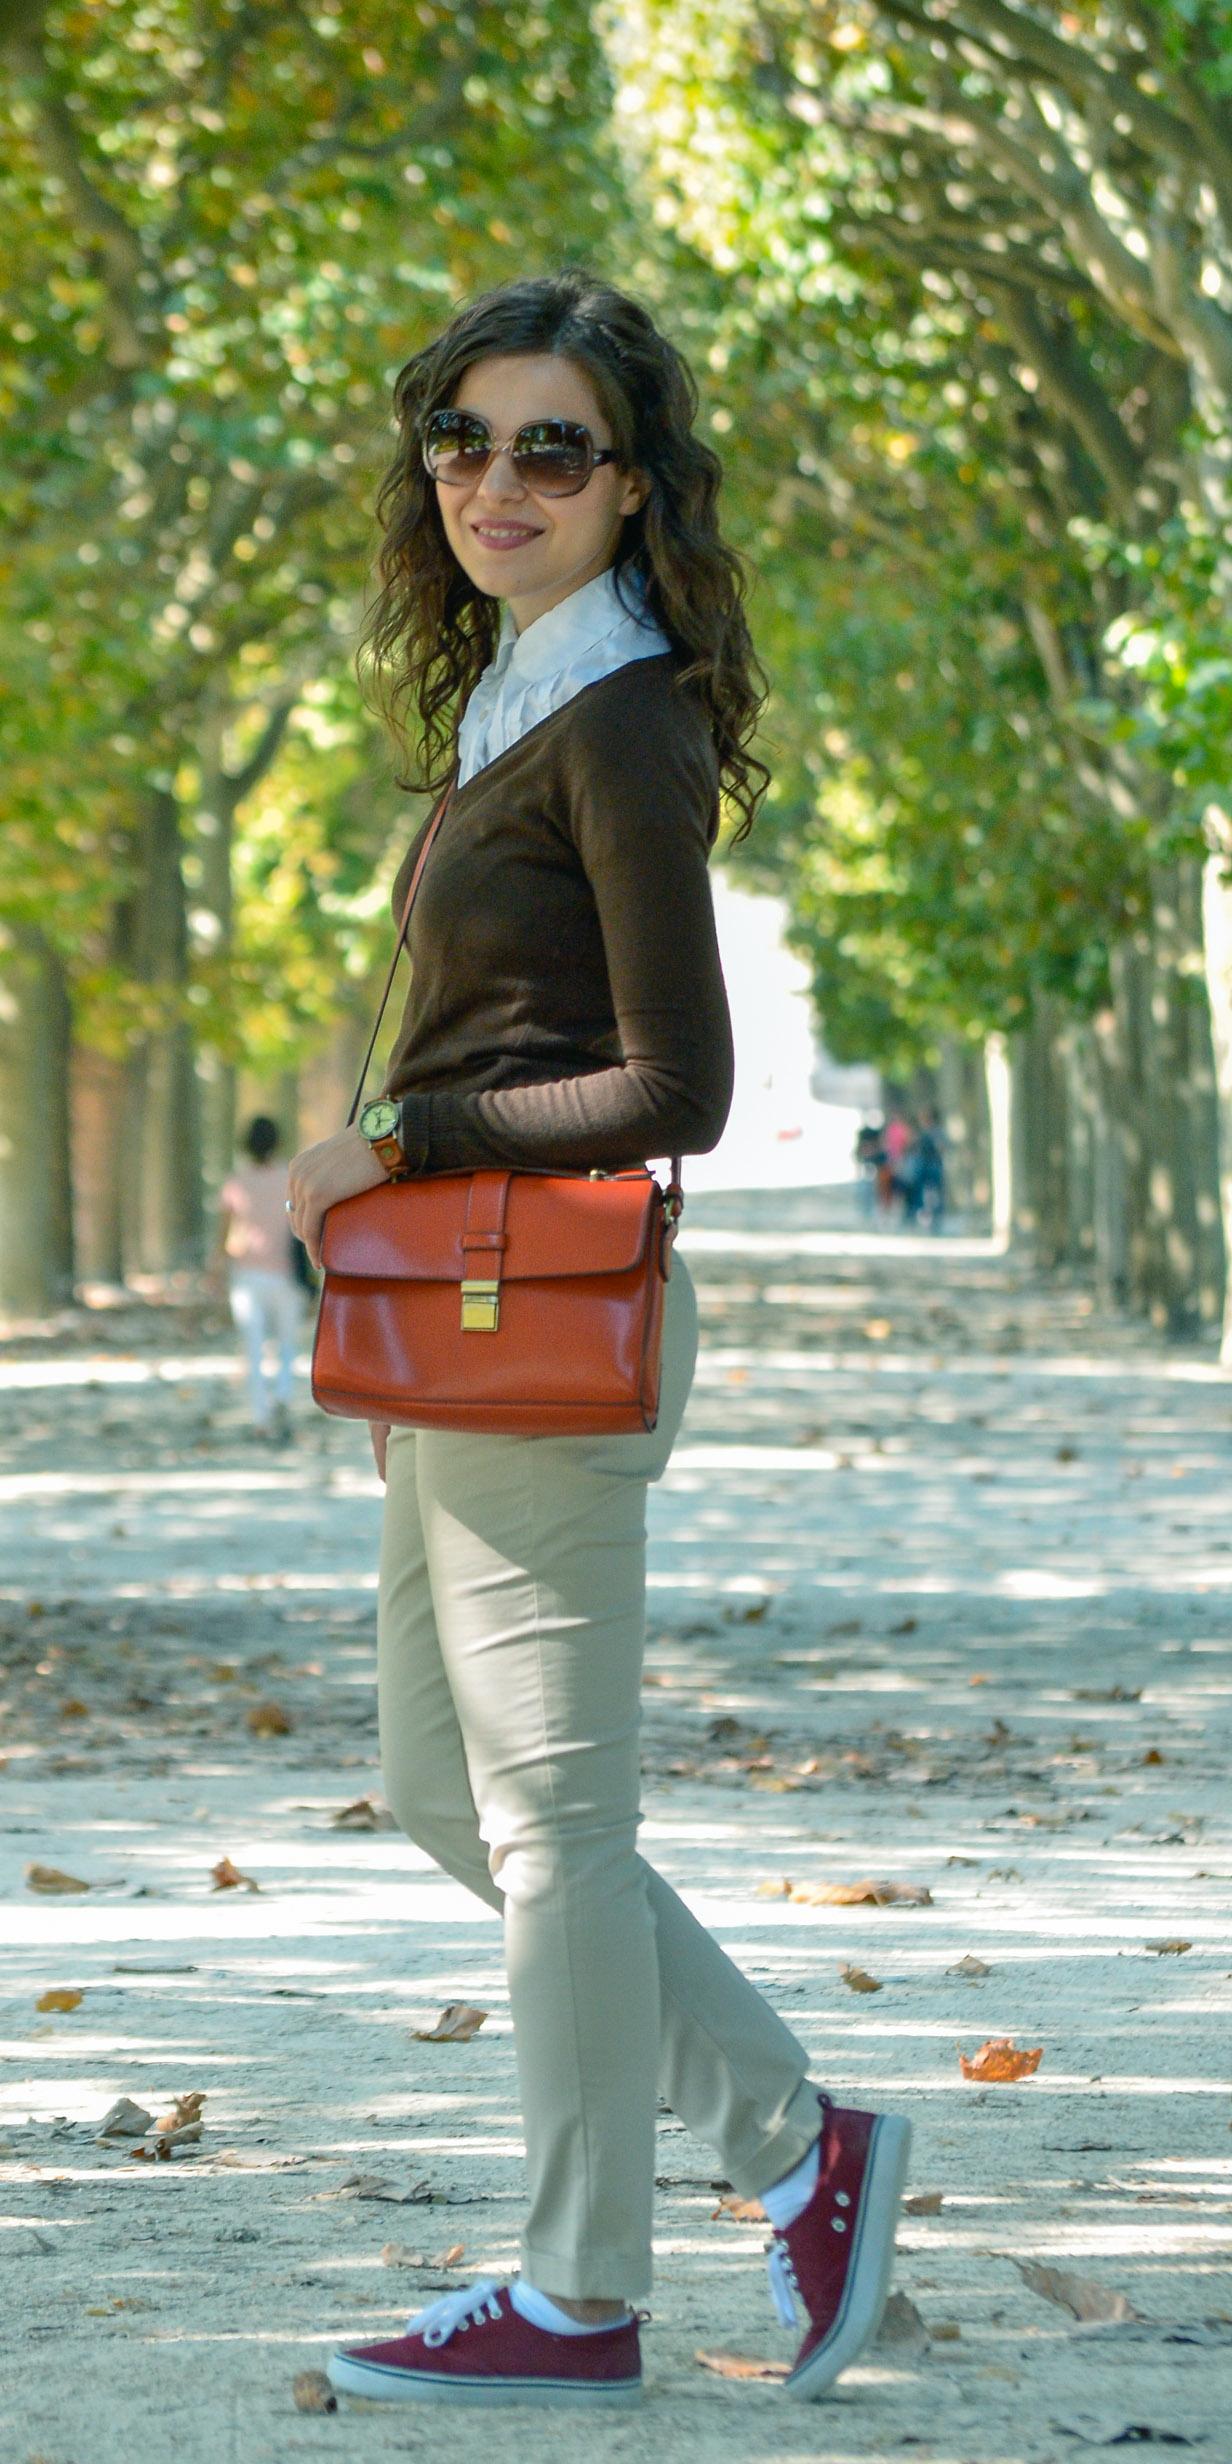 paris nude pants blue jacket koton burgundy sneakers h&m orange bag the bag shop Eiffel tower moulin rouge monmartre v neck brown sweater